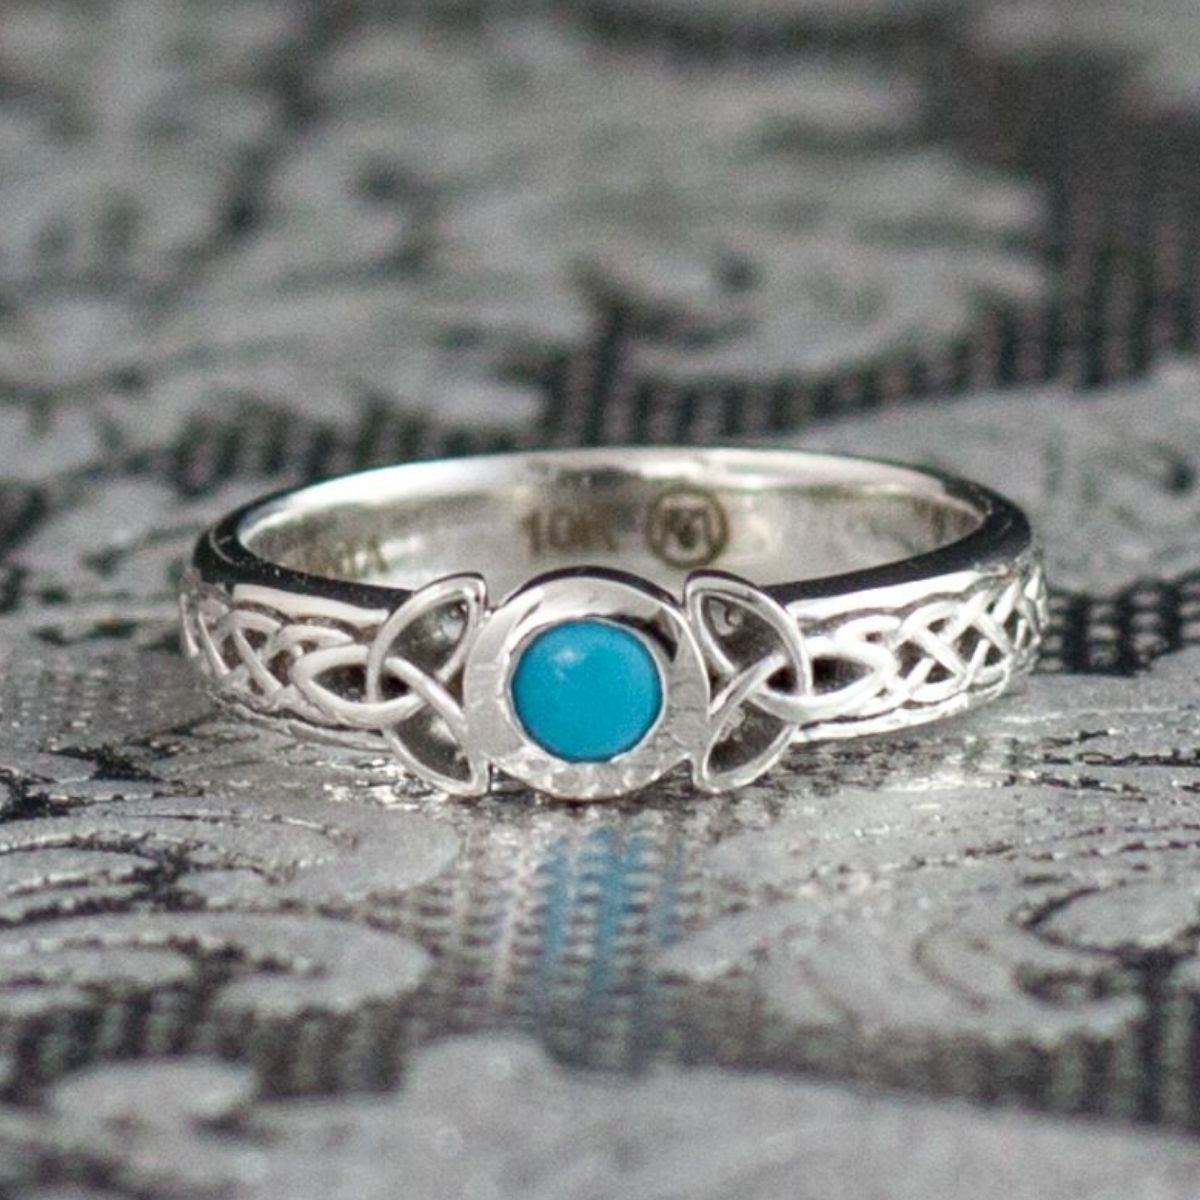 Trinity Knots And Turquoise A Wonderful Unmon Bination: Modern Irish Wedding Rings At Websimilar.org